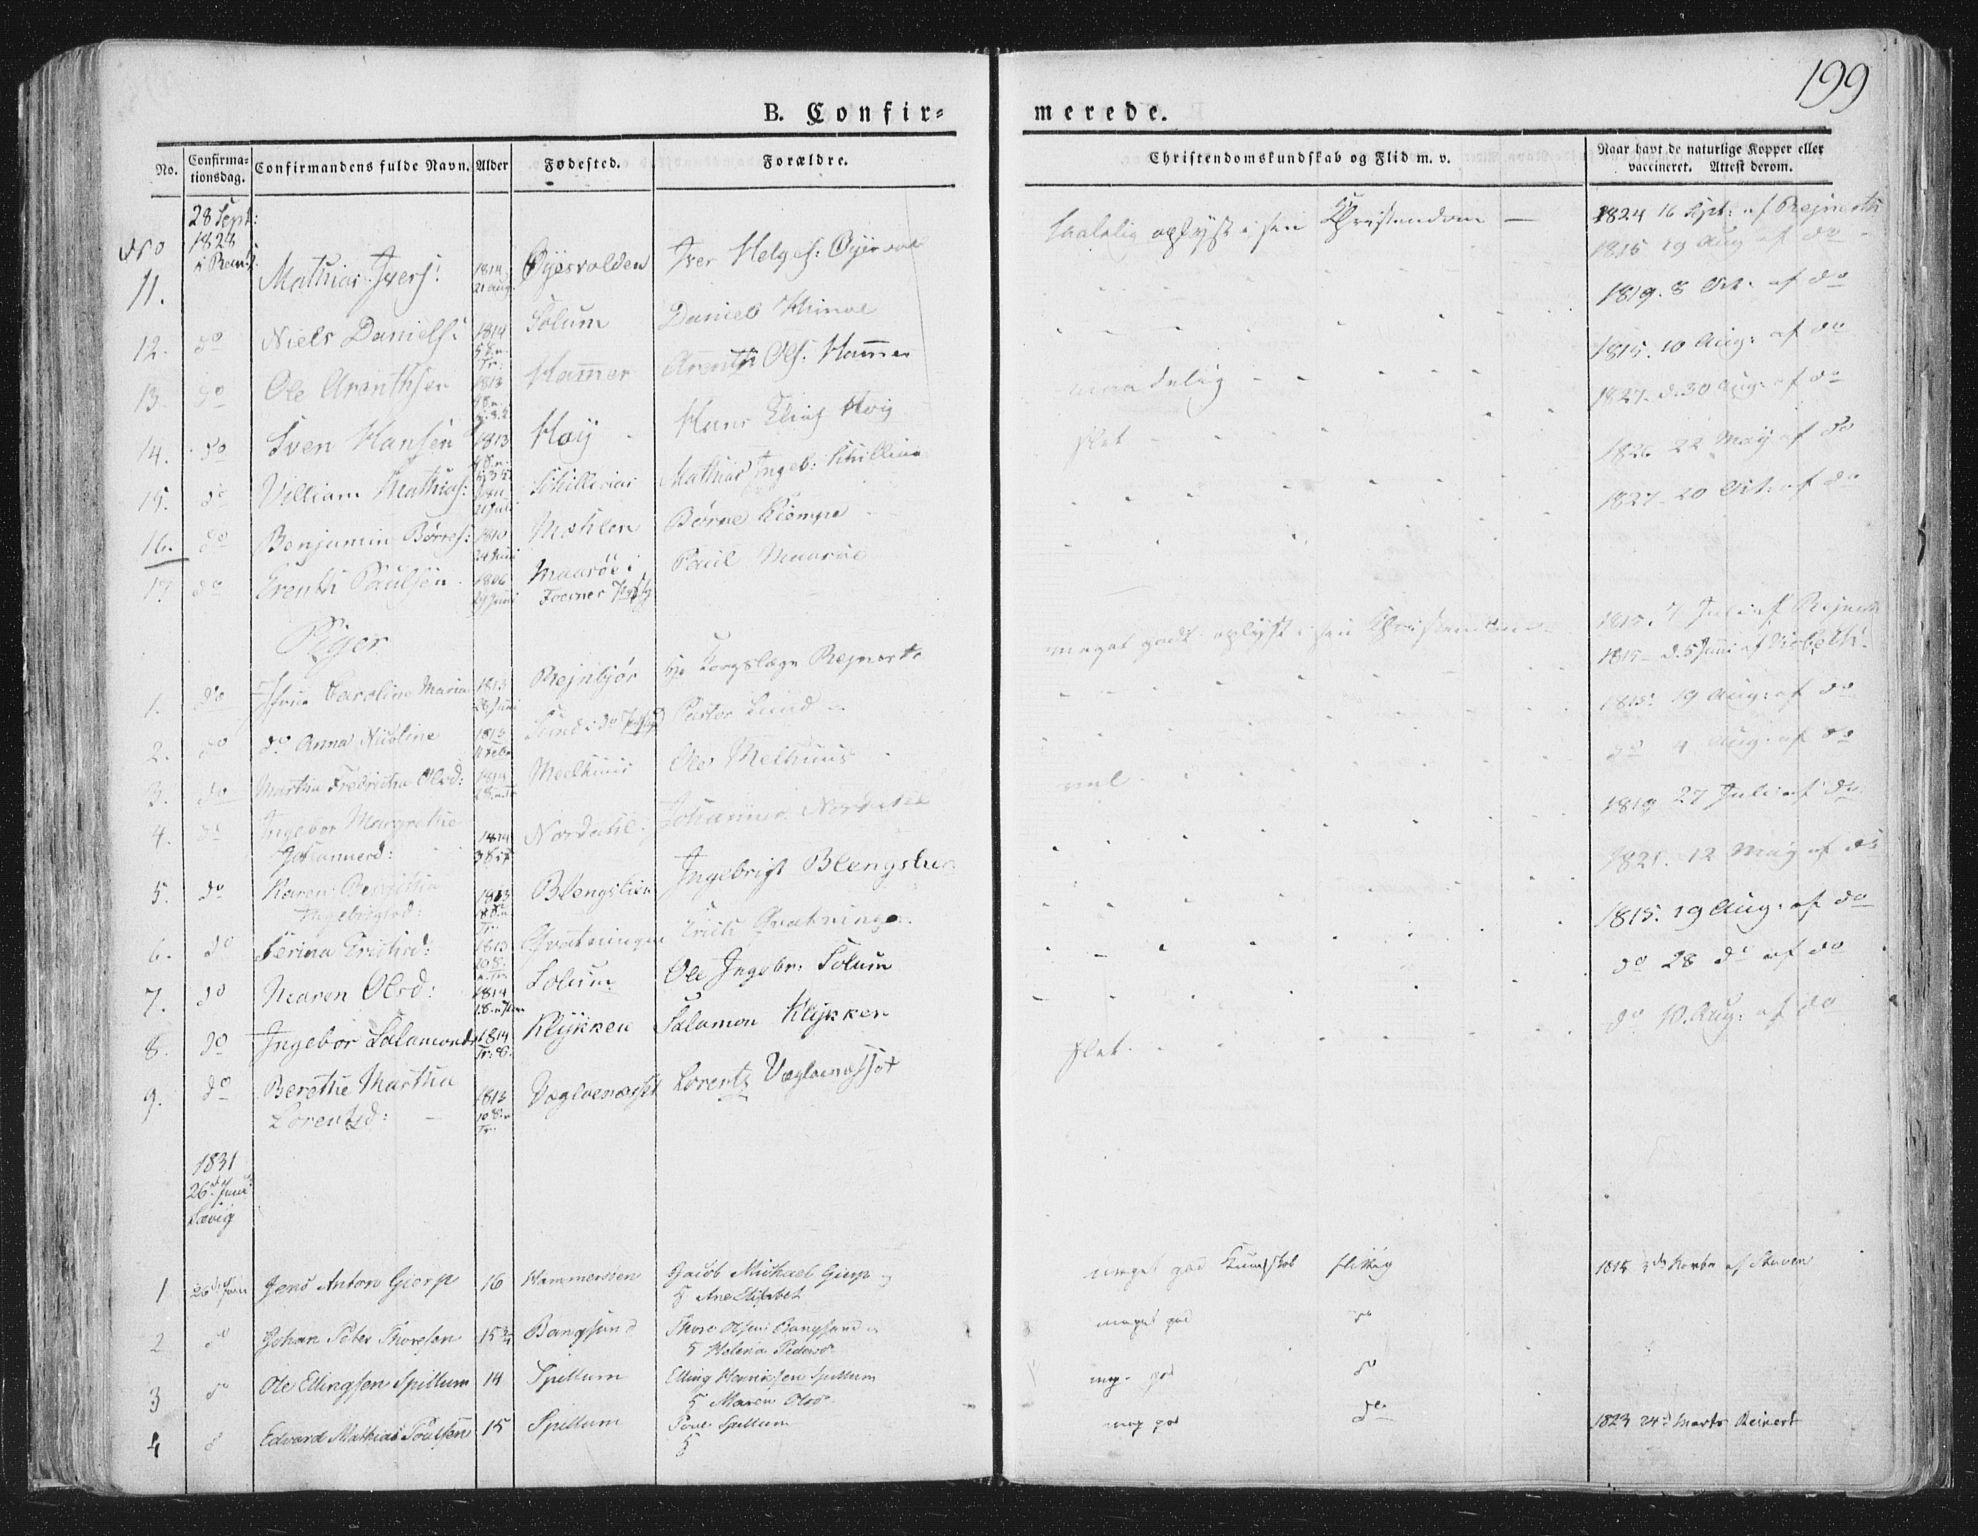 SAT, Ministerialprotokoller, klokkerbøker og fødselsregistre - Nord-Trøndelag, 764/L0551: Ministerialbok nr. 764A07a, 1824-1864, s. 199